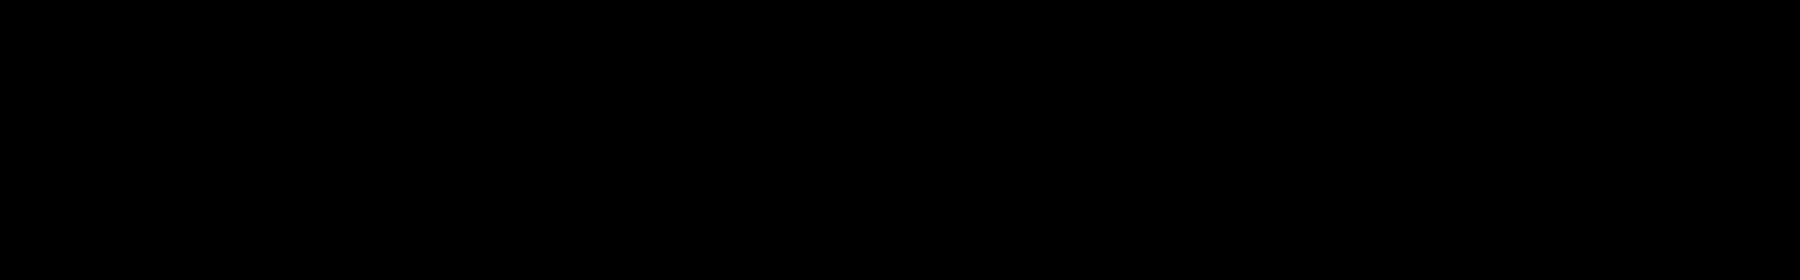 Tunecraft FX Vault Vol.1 audio waveform